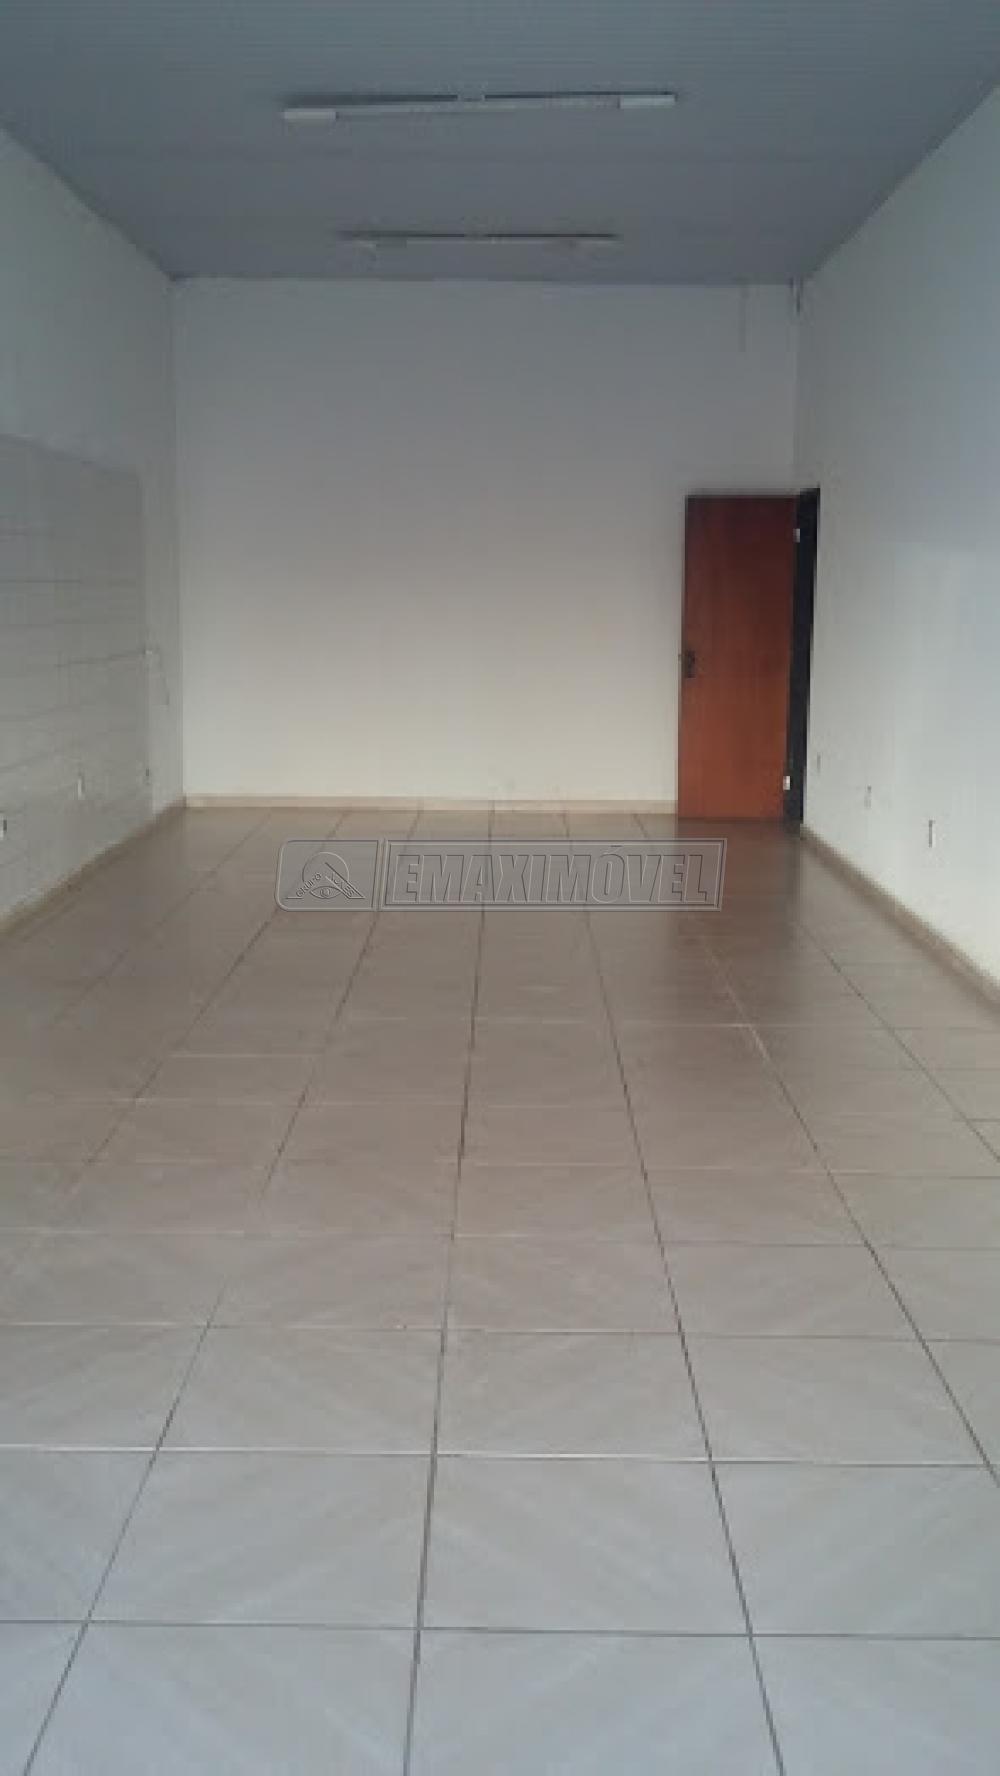 Comprar Comercial / Prédios em Sorocaba R$ 950.000,00 - Foto 3